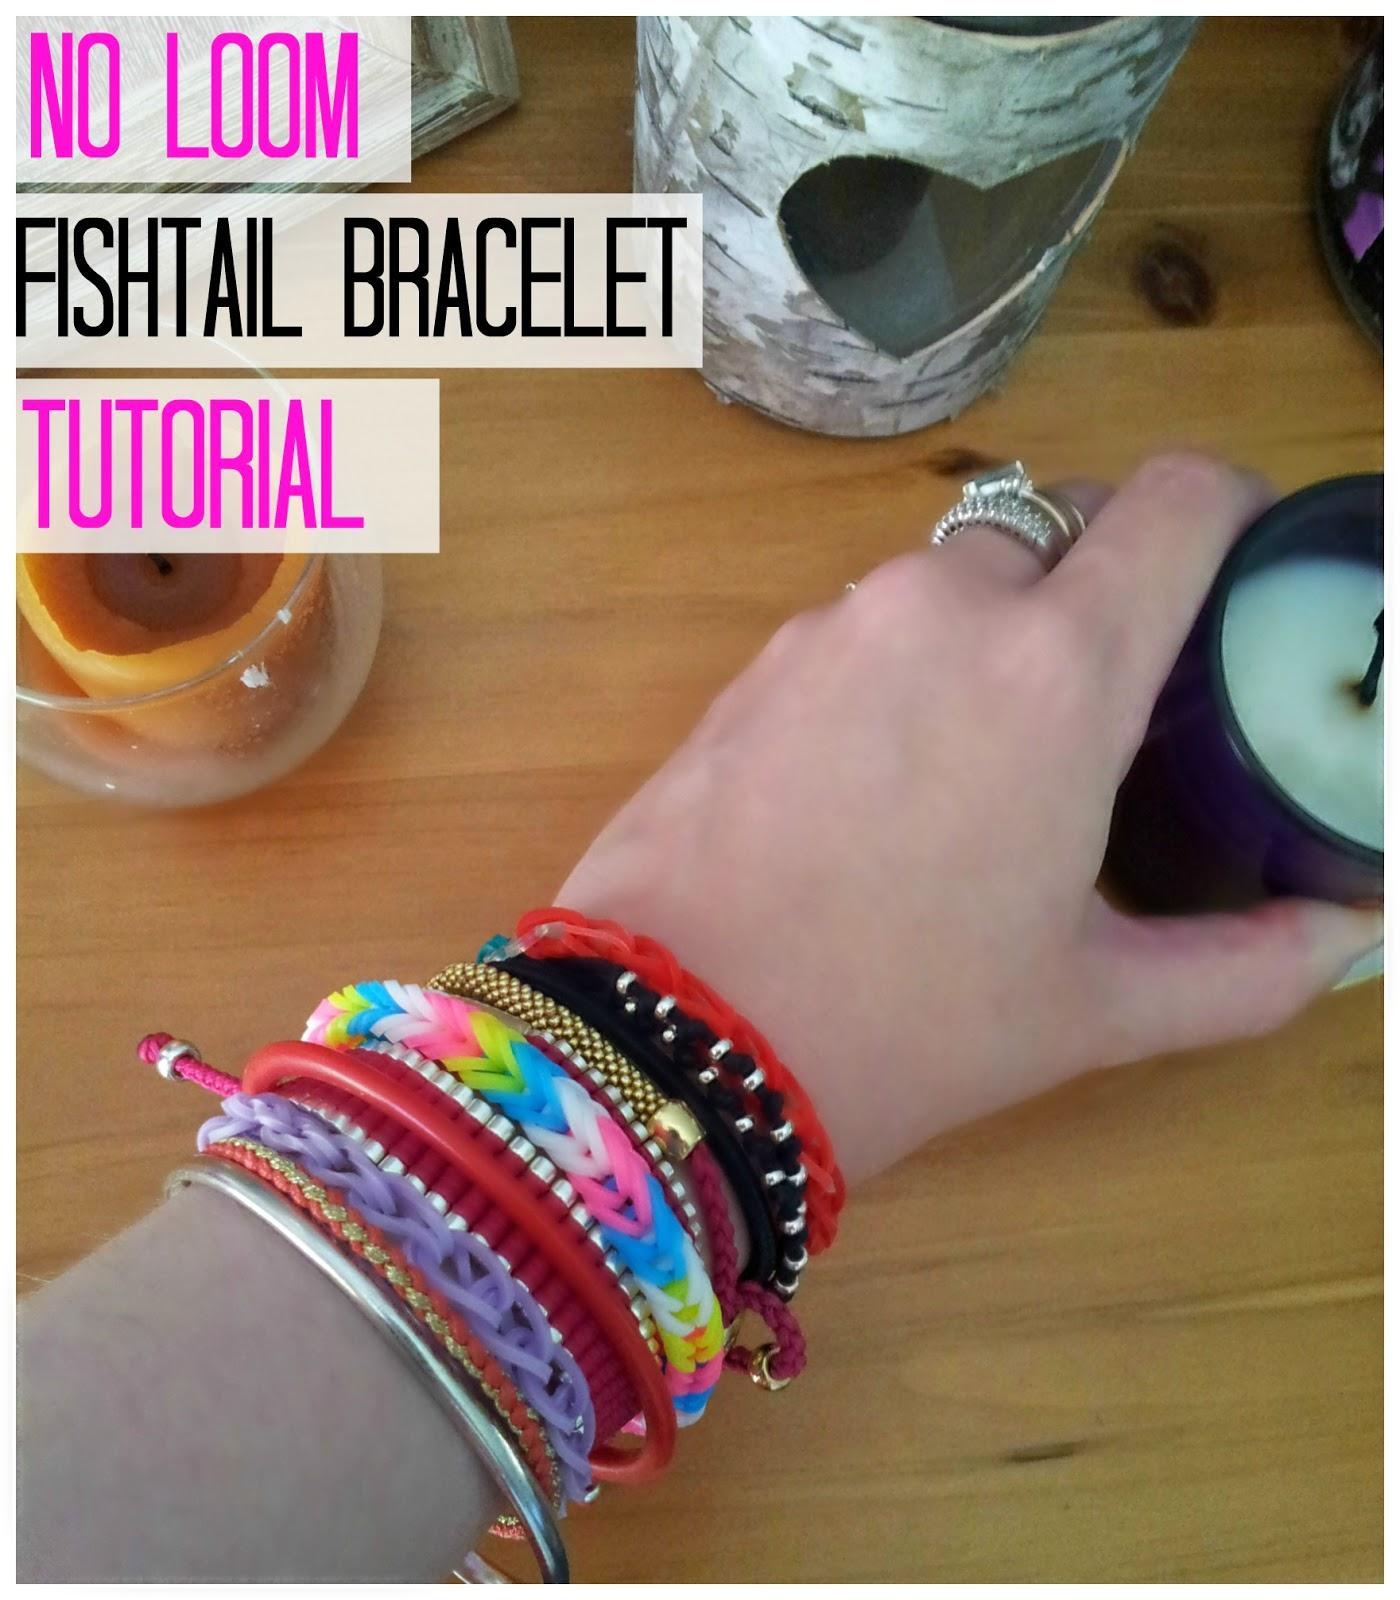 fishtail bracelet tutorial - photo #20